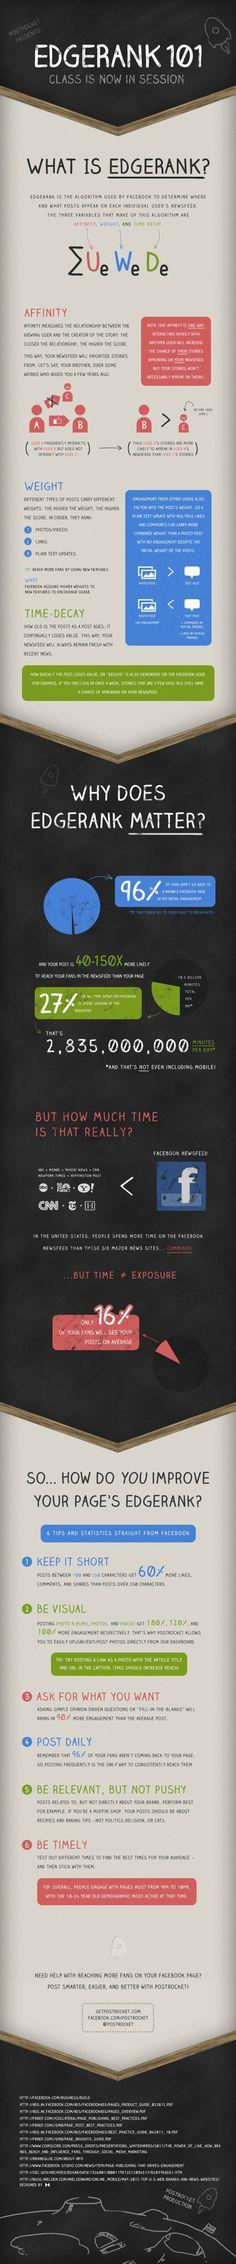 #Facebook #Edge rank